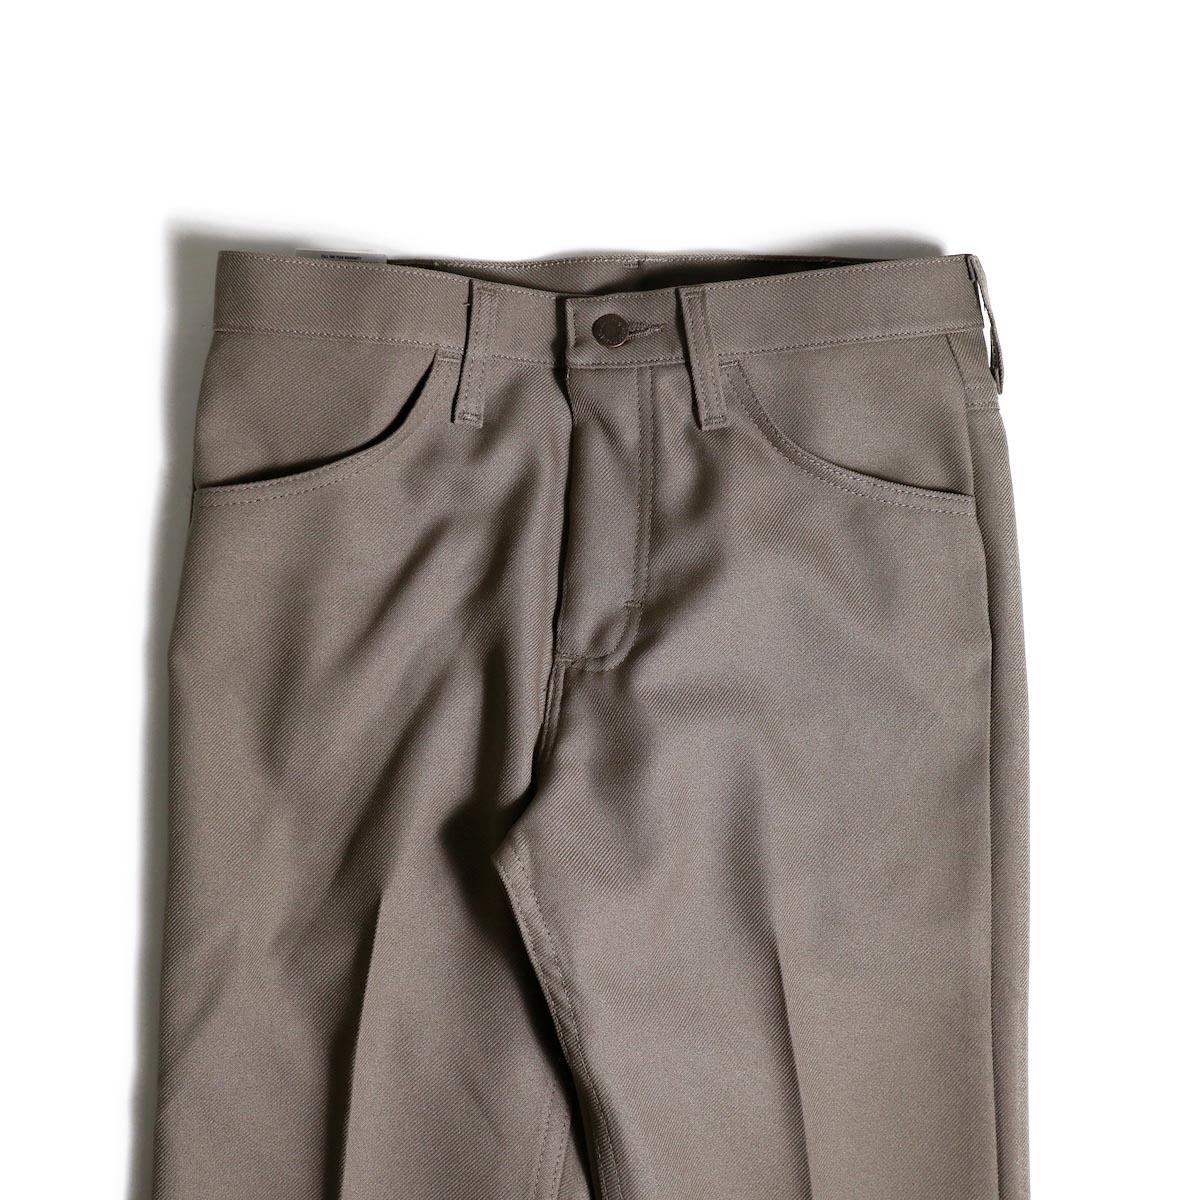 Wrangler / WRANCHER DRESS JEANS (Birch)ウエスト